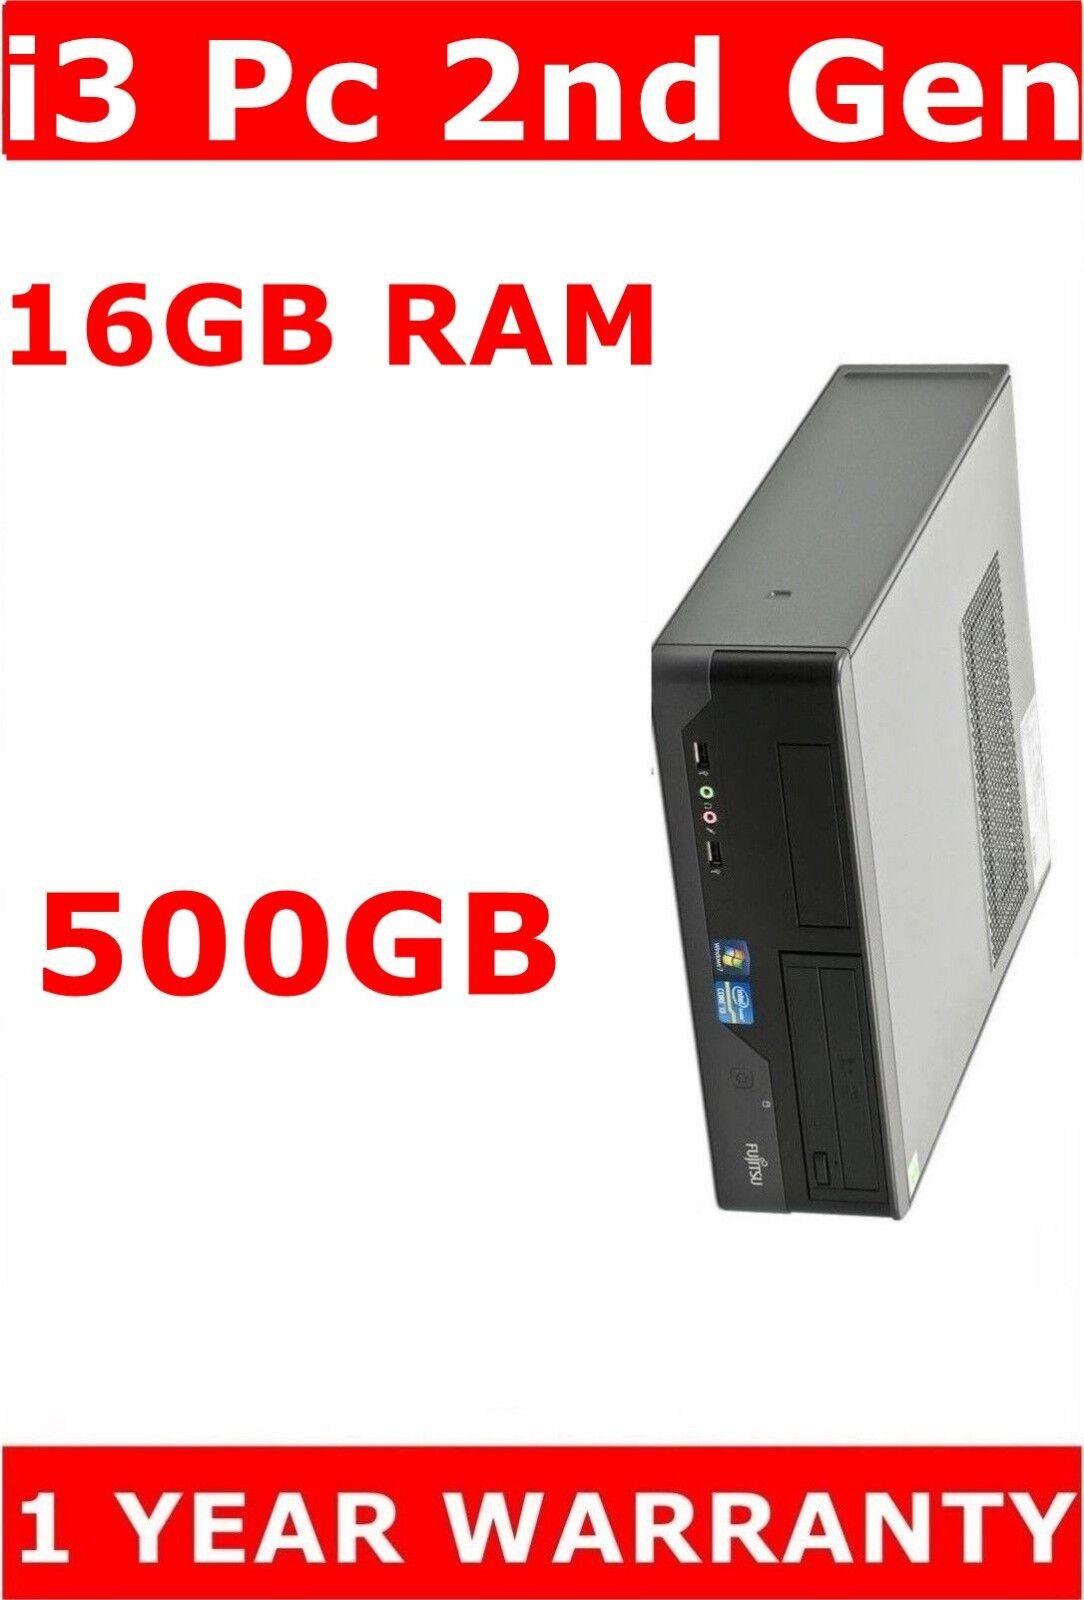 Computer Games - FUJITSU 2nd GEN i3 COMPUTER PC 16GB RAM 500GB DUAL SCREEN GAMING PC GT 710 2GB